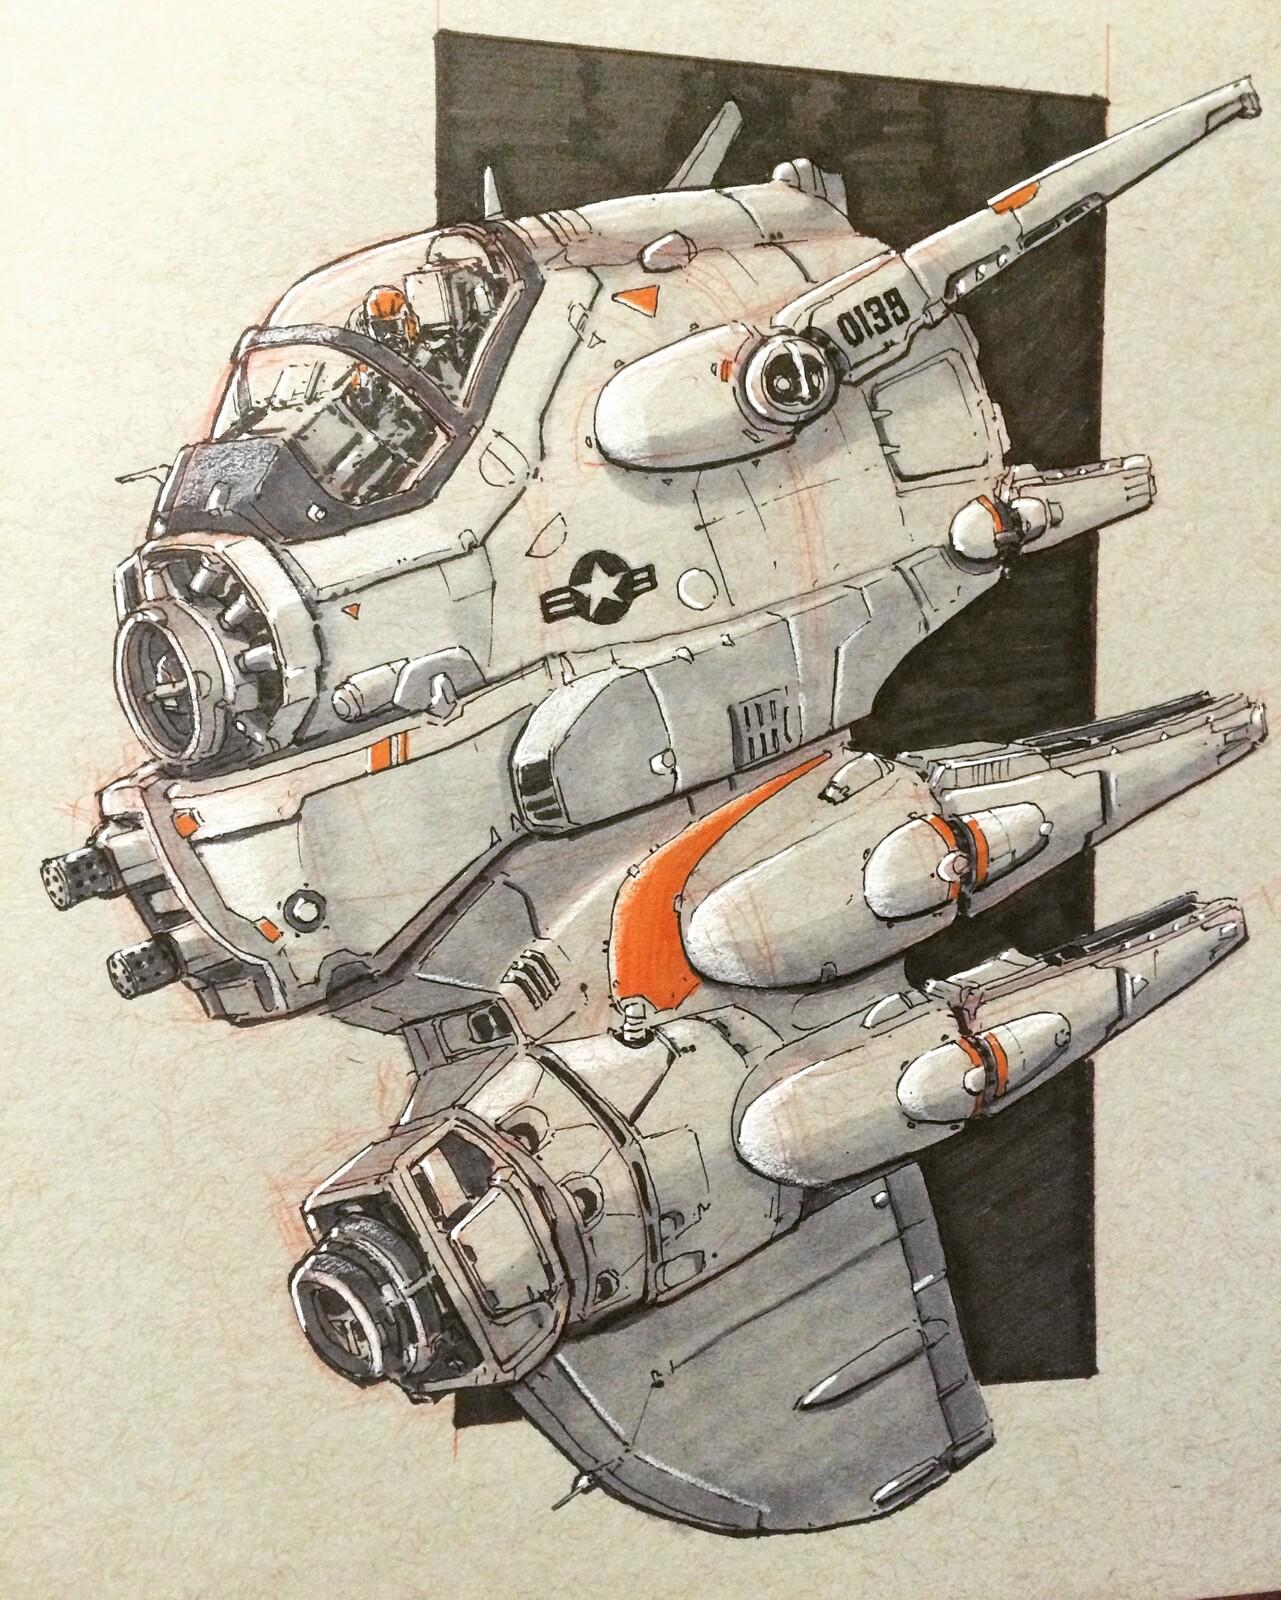 Original Concept Art by Virnard Magpantay